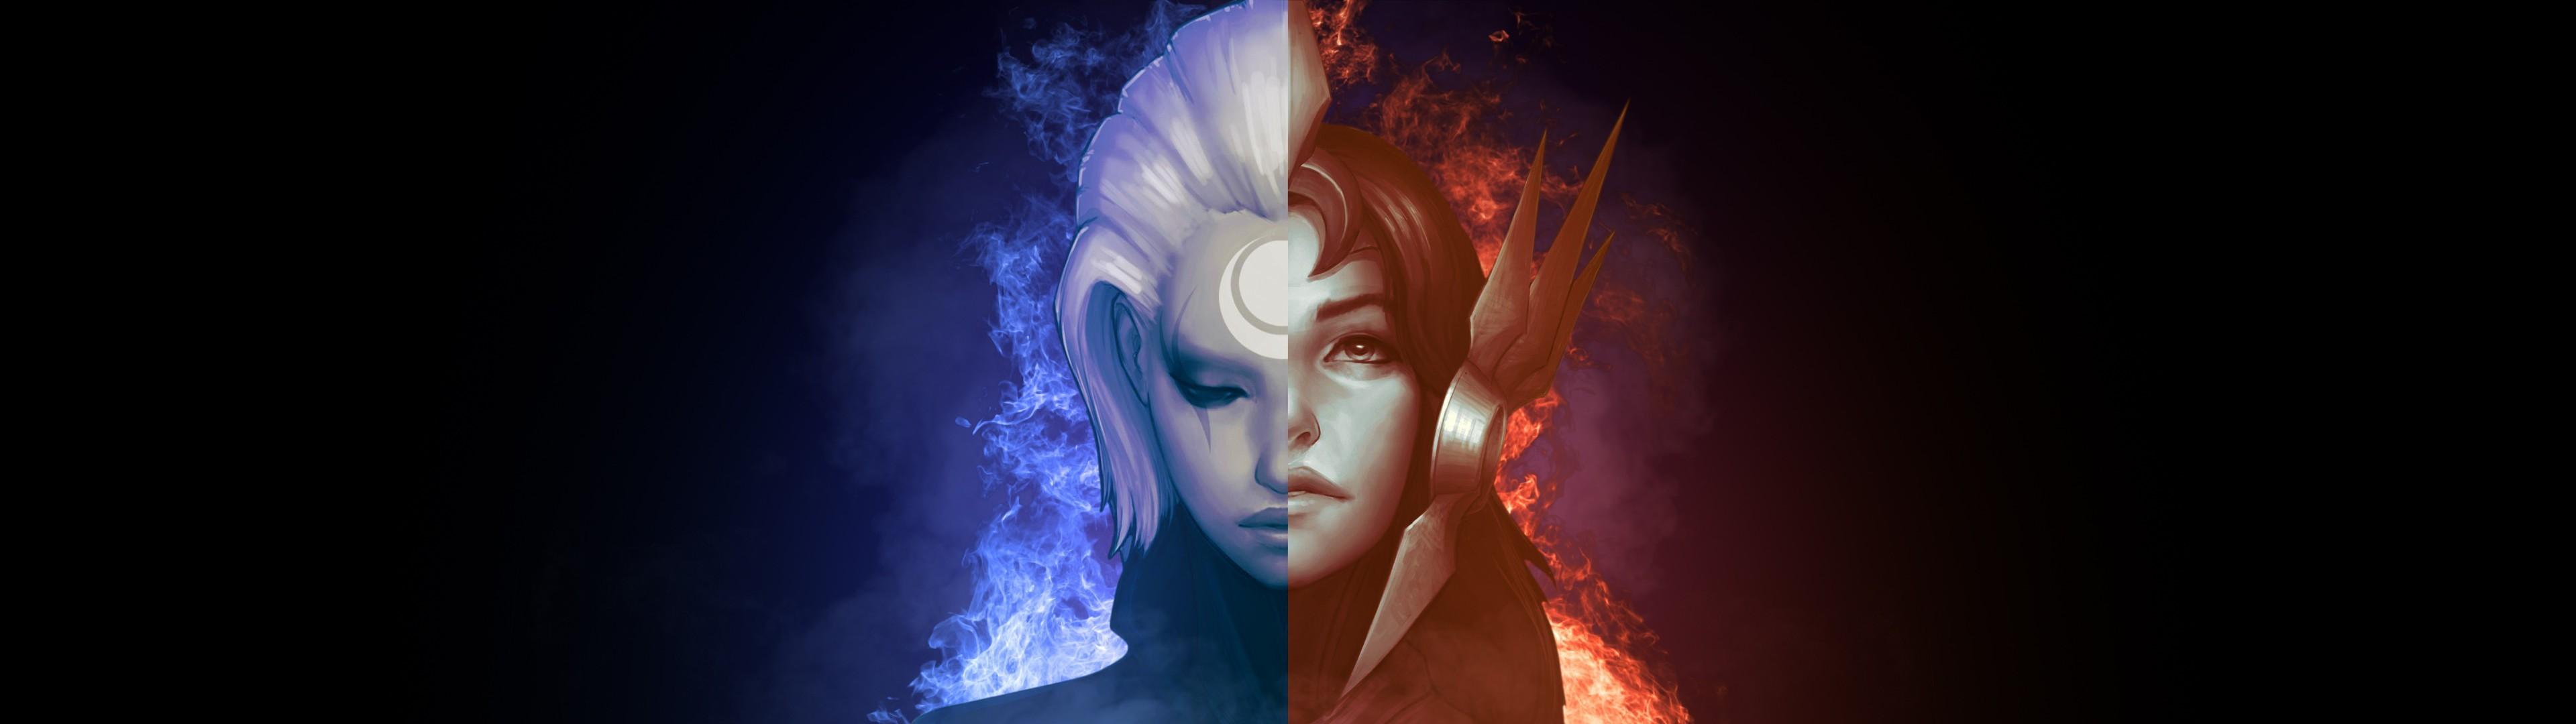 Video Game – League Of Legends Leona (League Of Legends) Diana (League Of